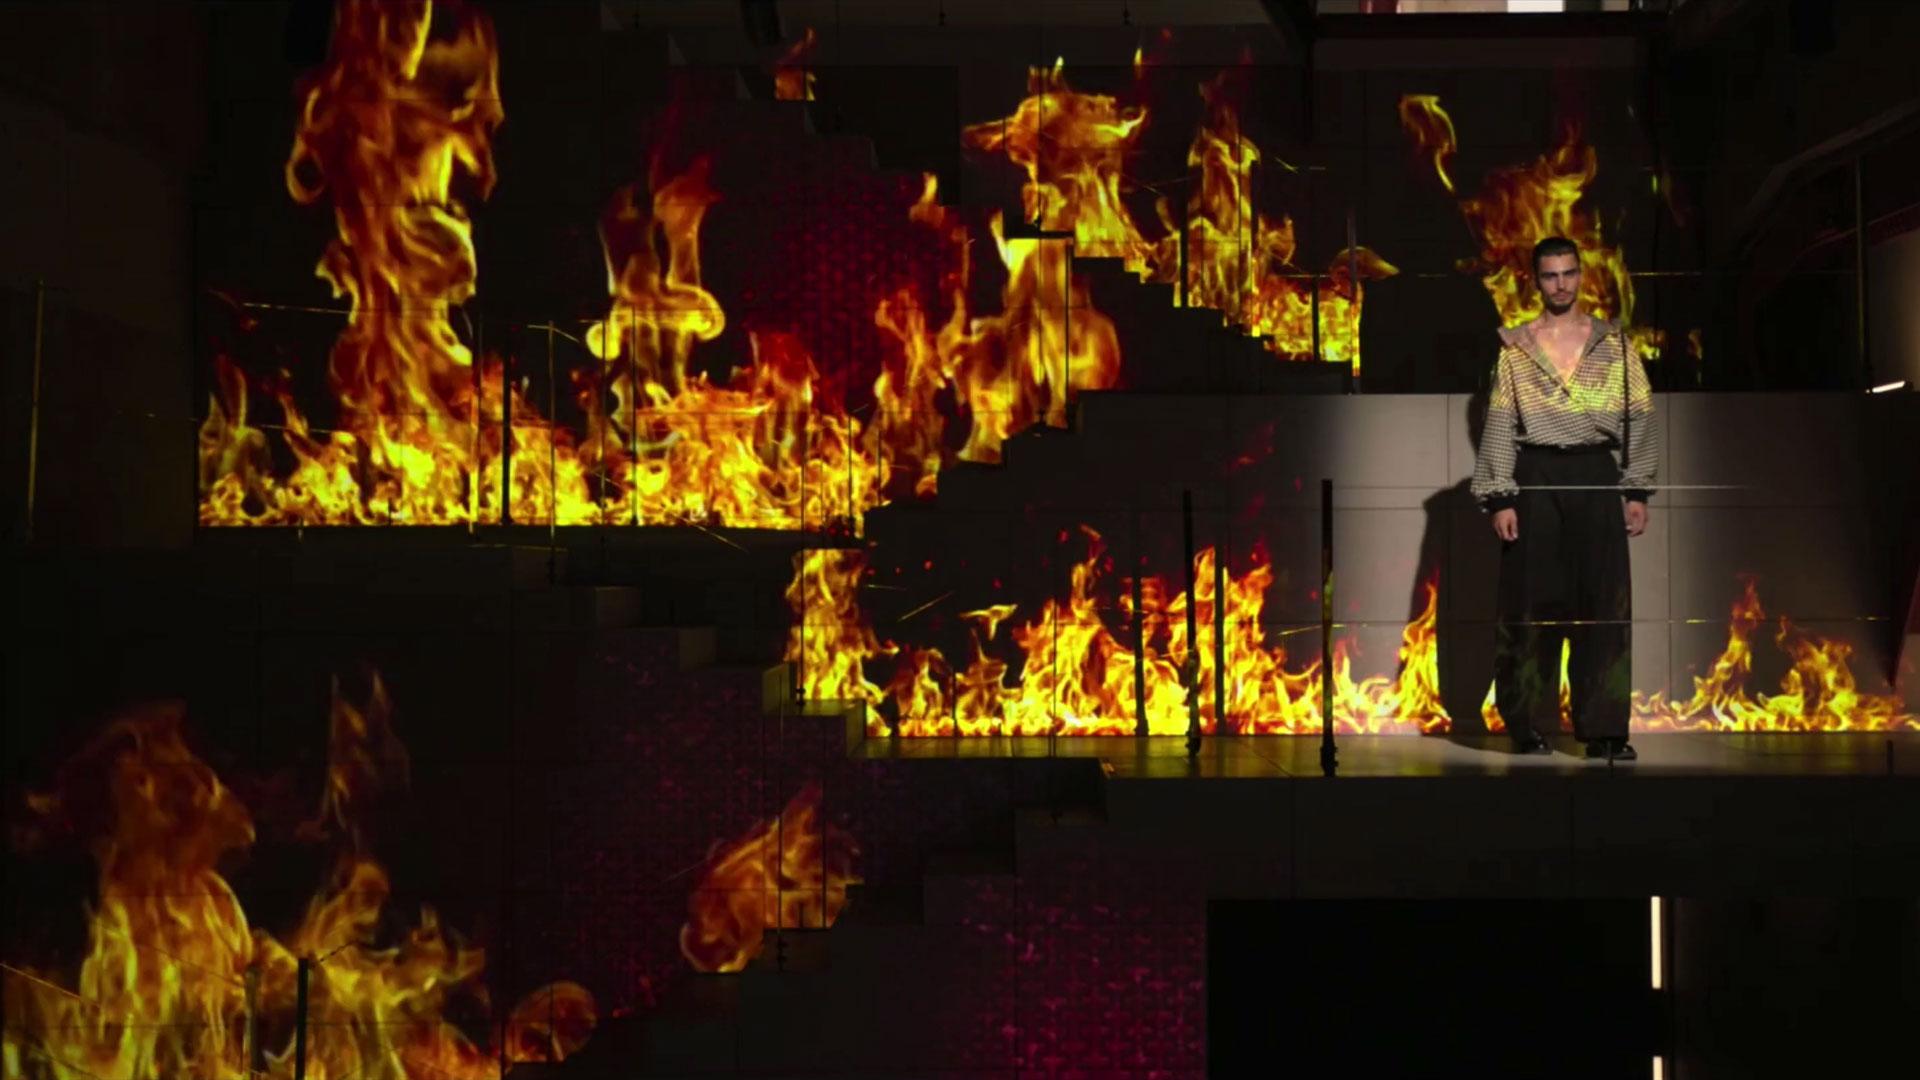 amazon prime 3d projection mapping eventagrate fashion technology touch designer dubai japan fire